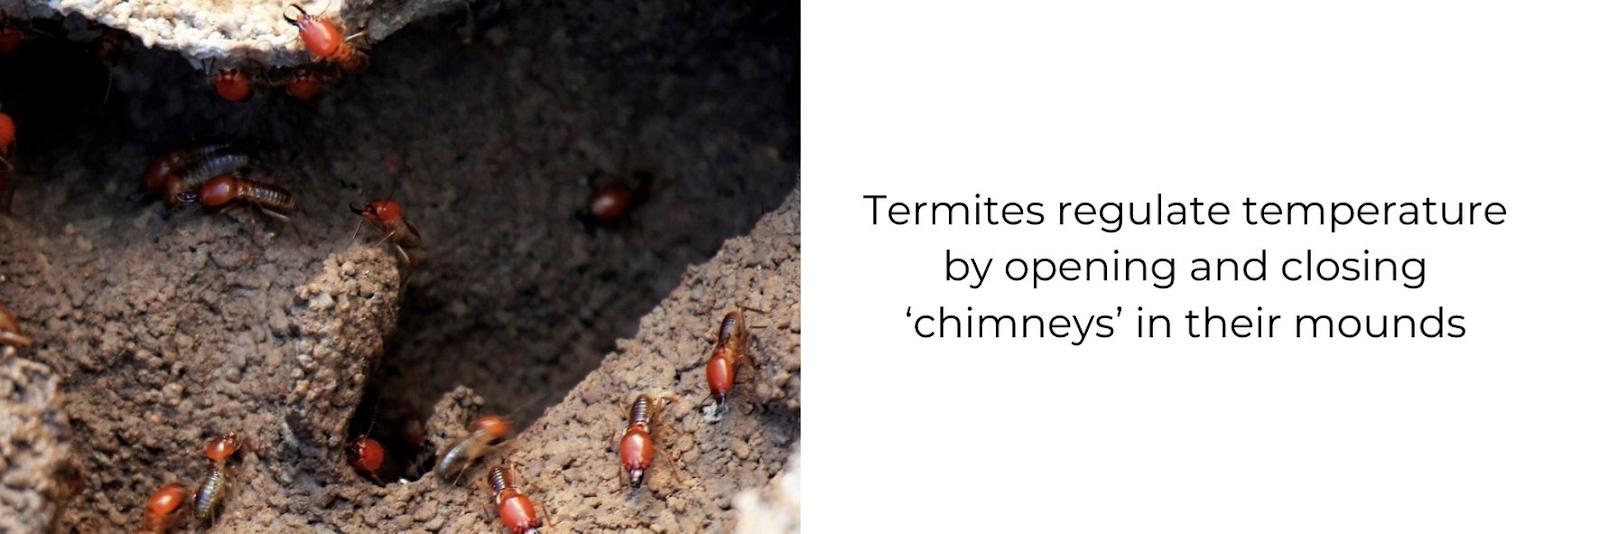 Fun fact about termites